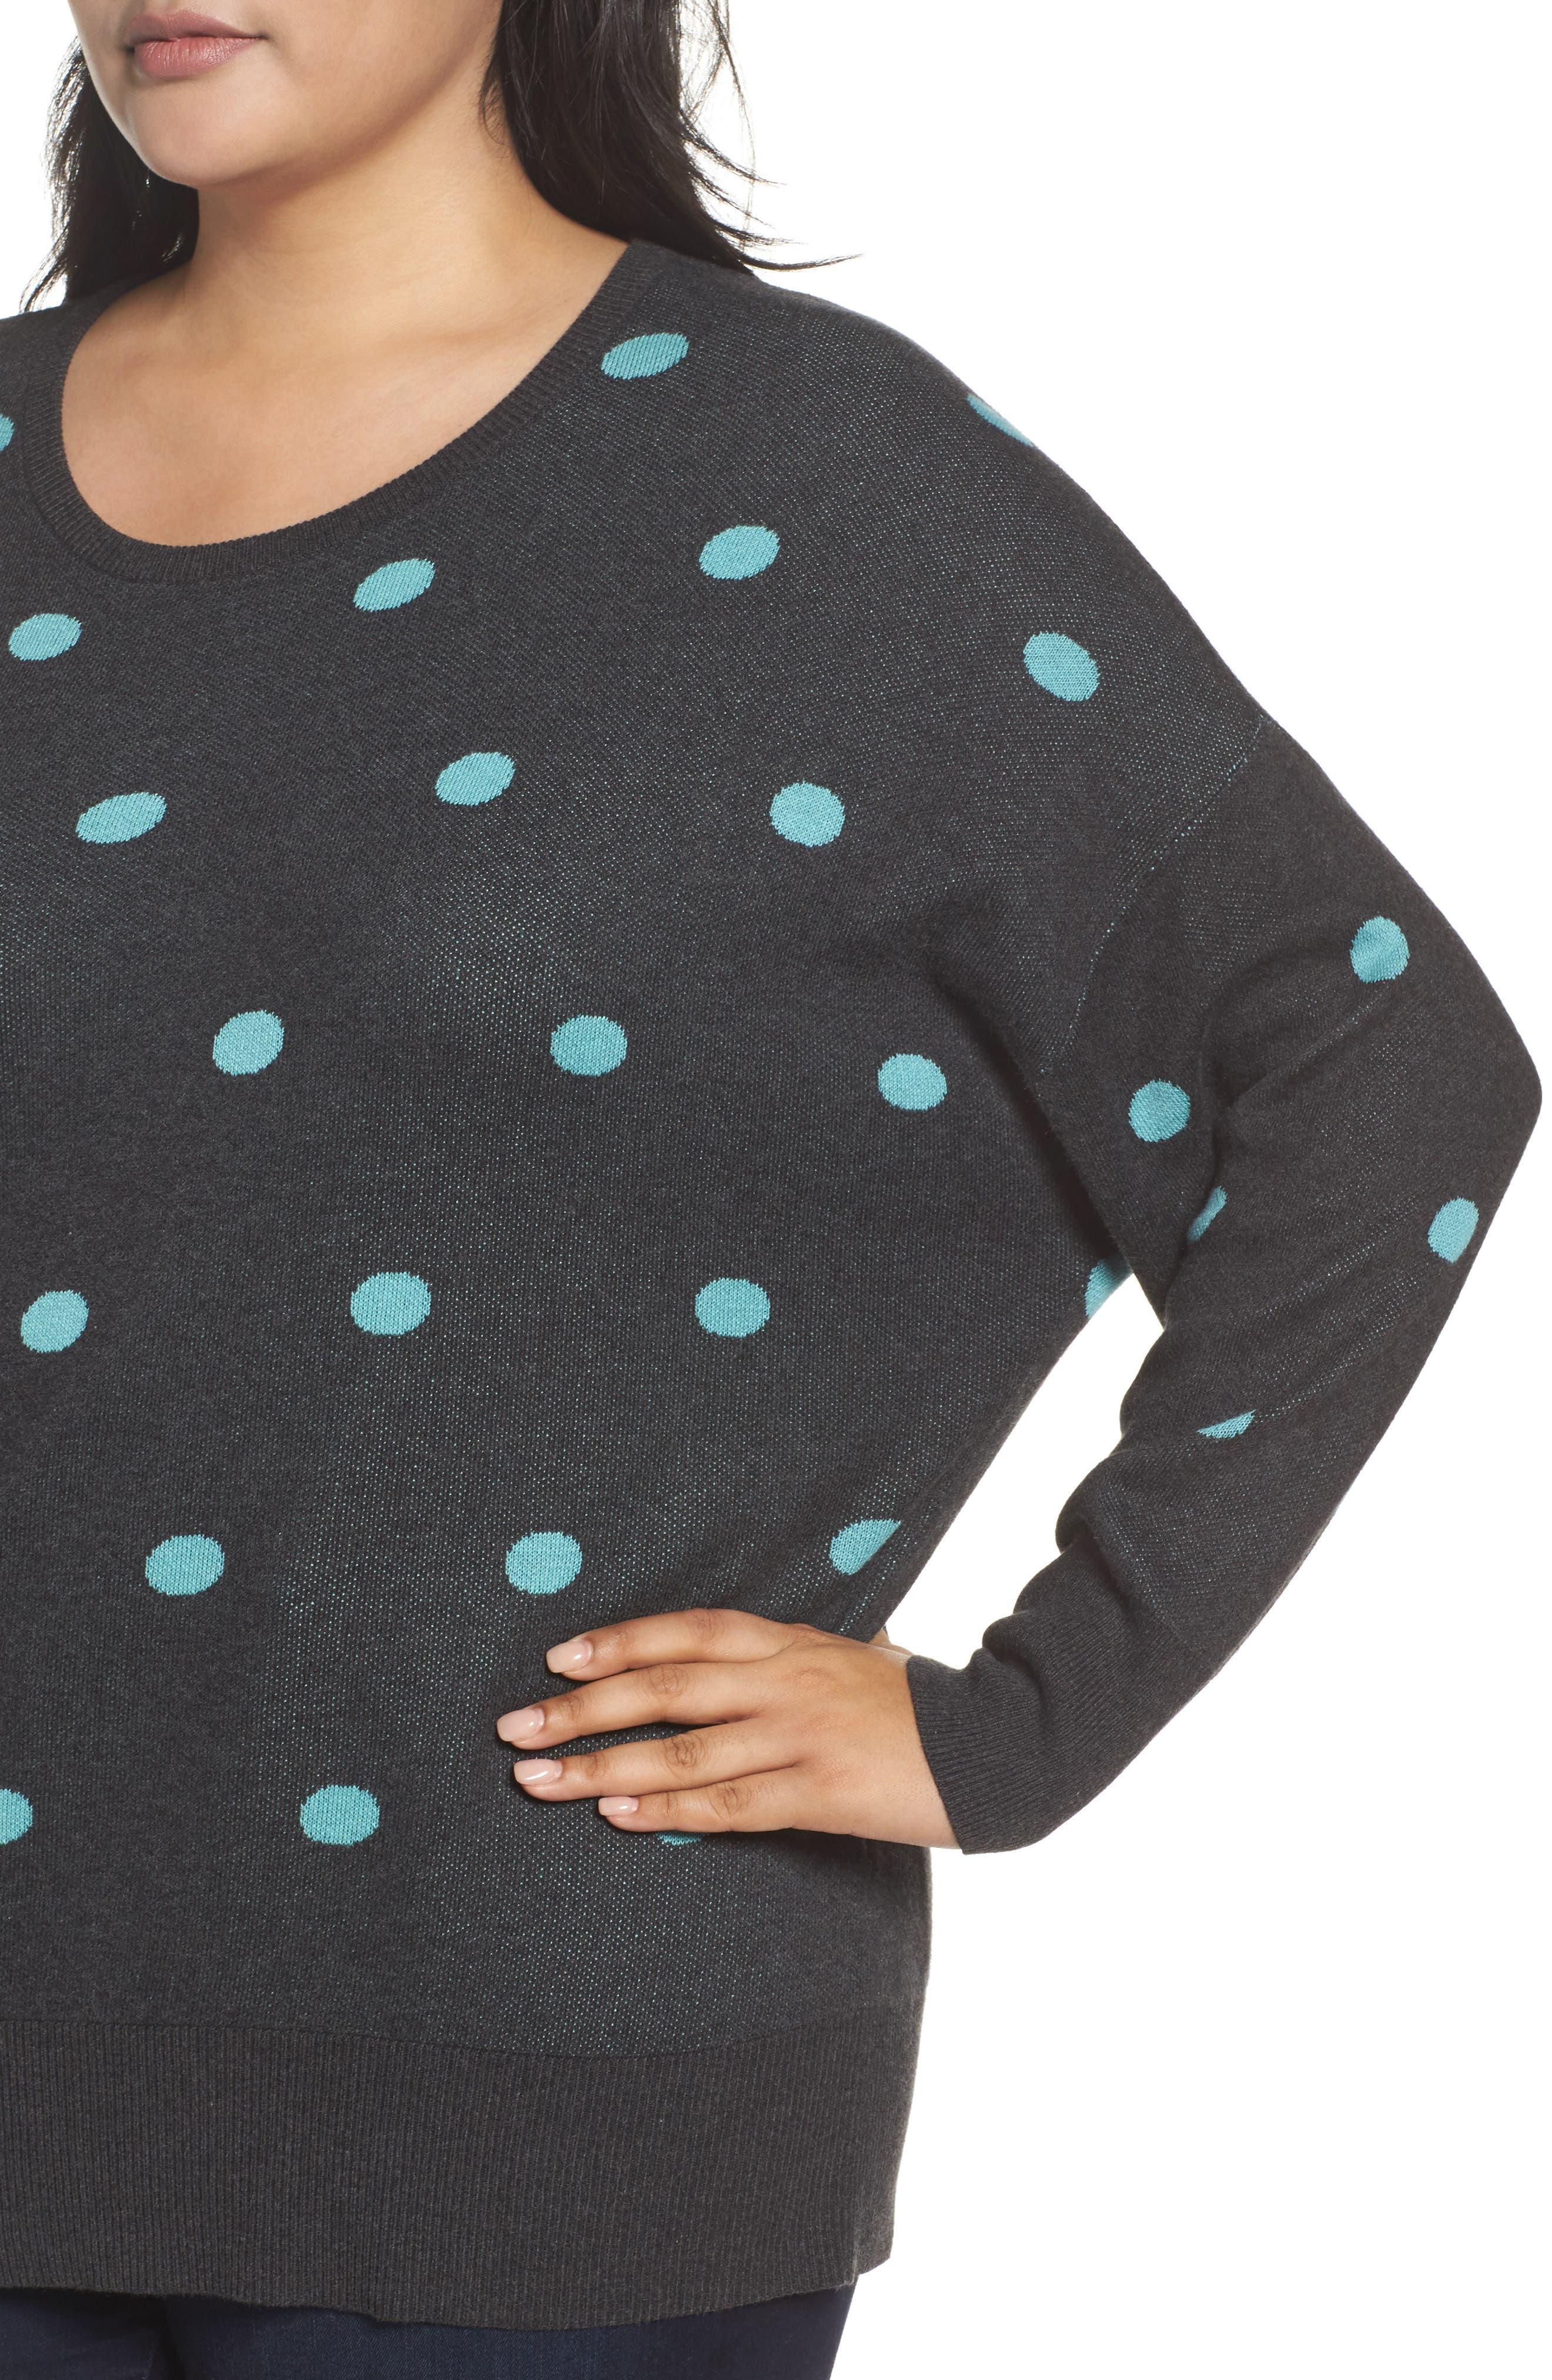 Dolman Sleeve Crewneck Sweater,                             Alternate thumbnail 4, color,                             Grey- Blue Dots Pattern